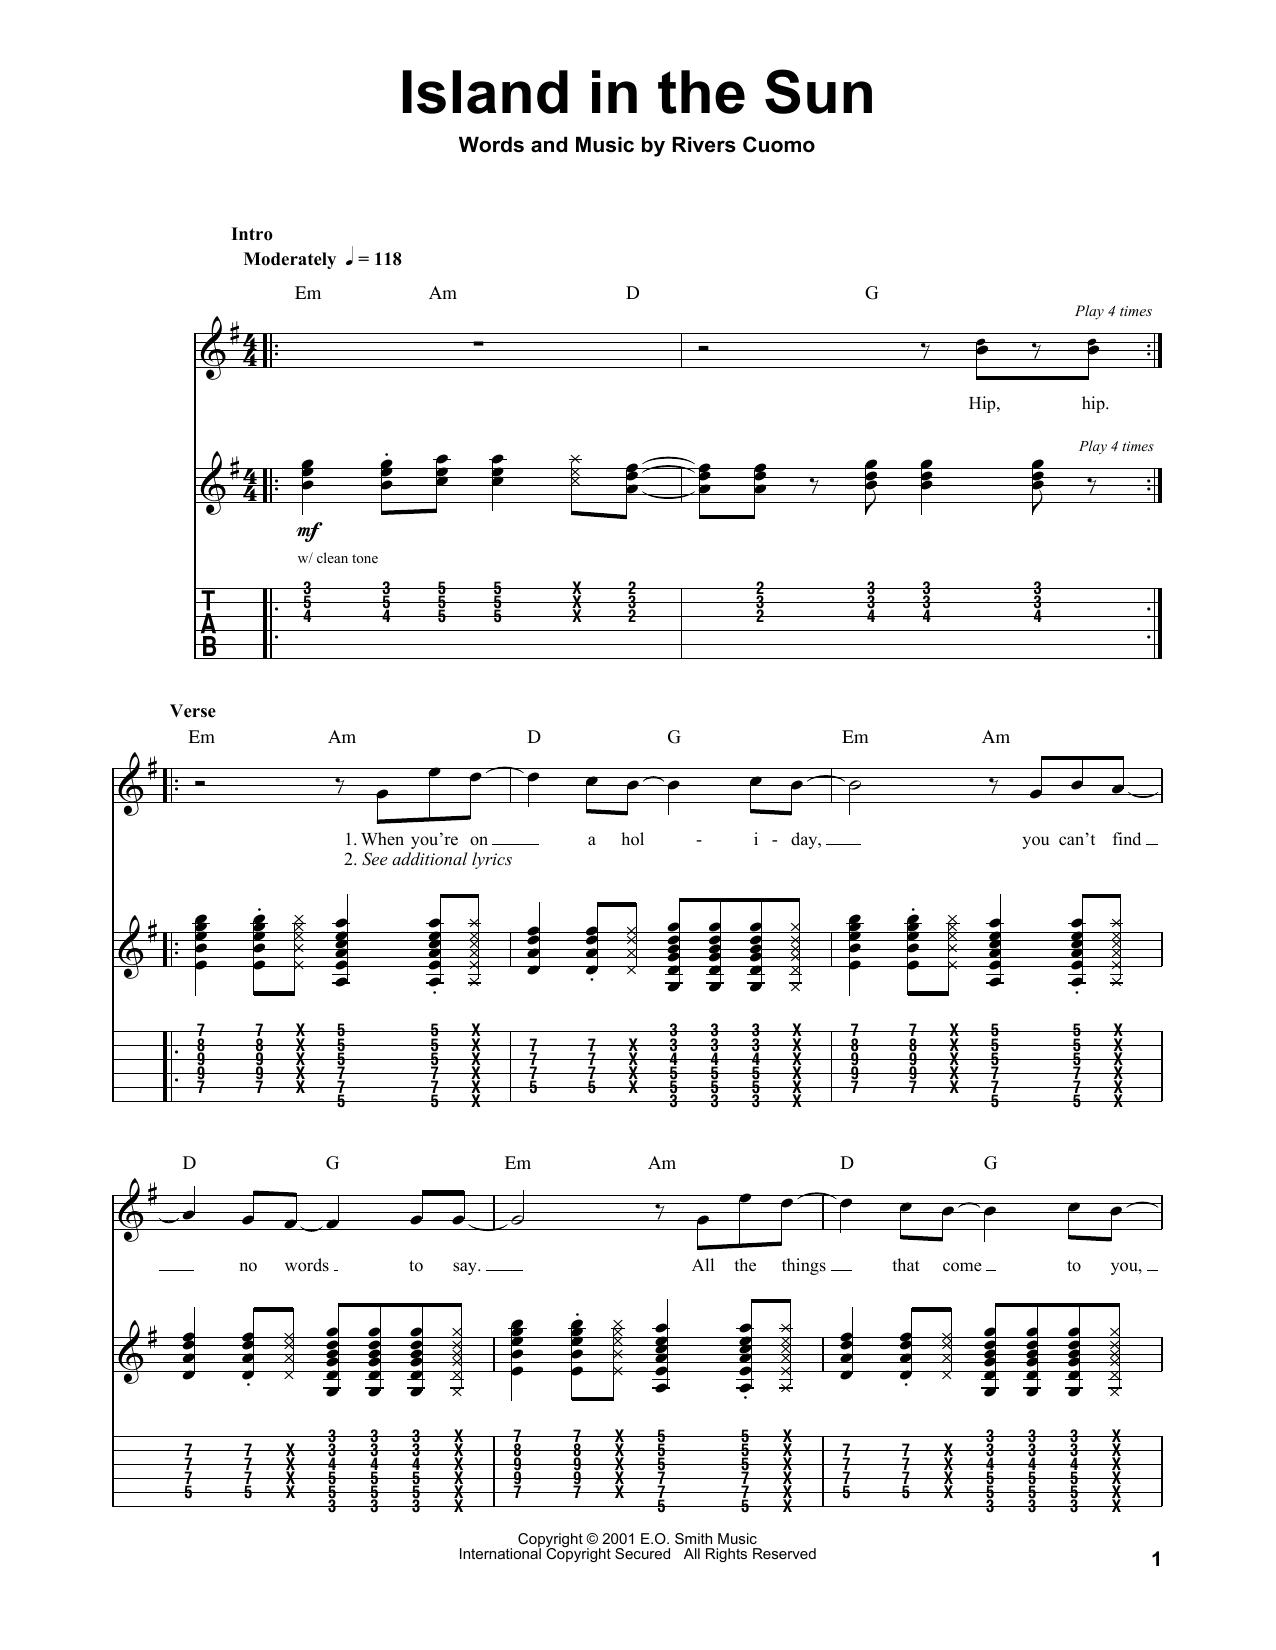 Enchanting Weezer Chords Mold Song Chords Images Apa Montrealfo